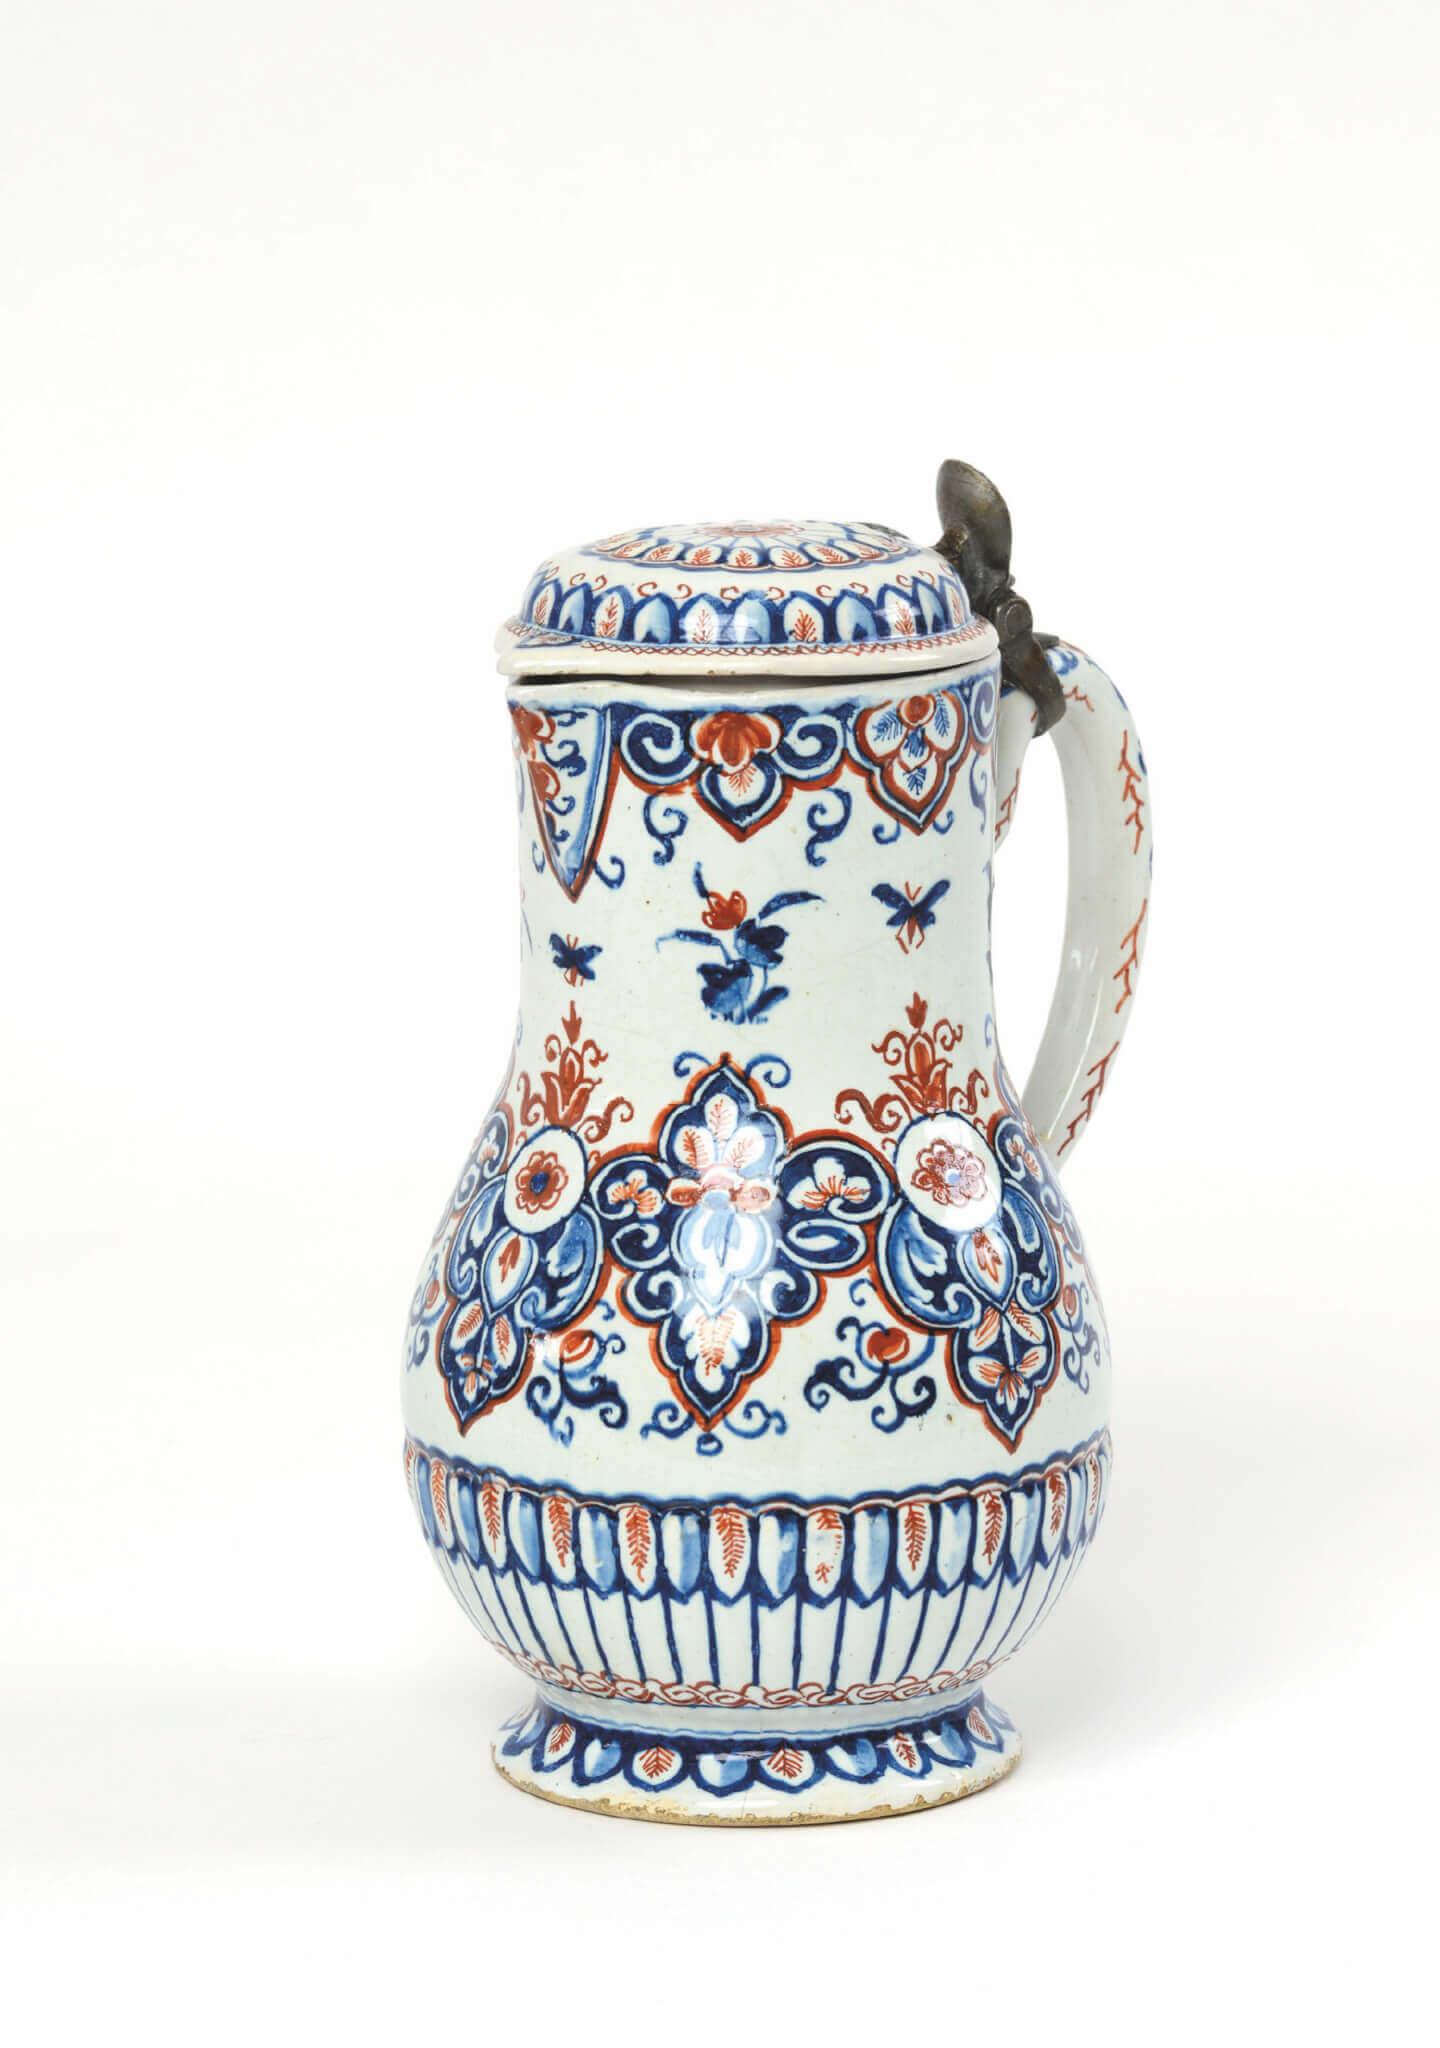 Polychrome jug